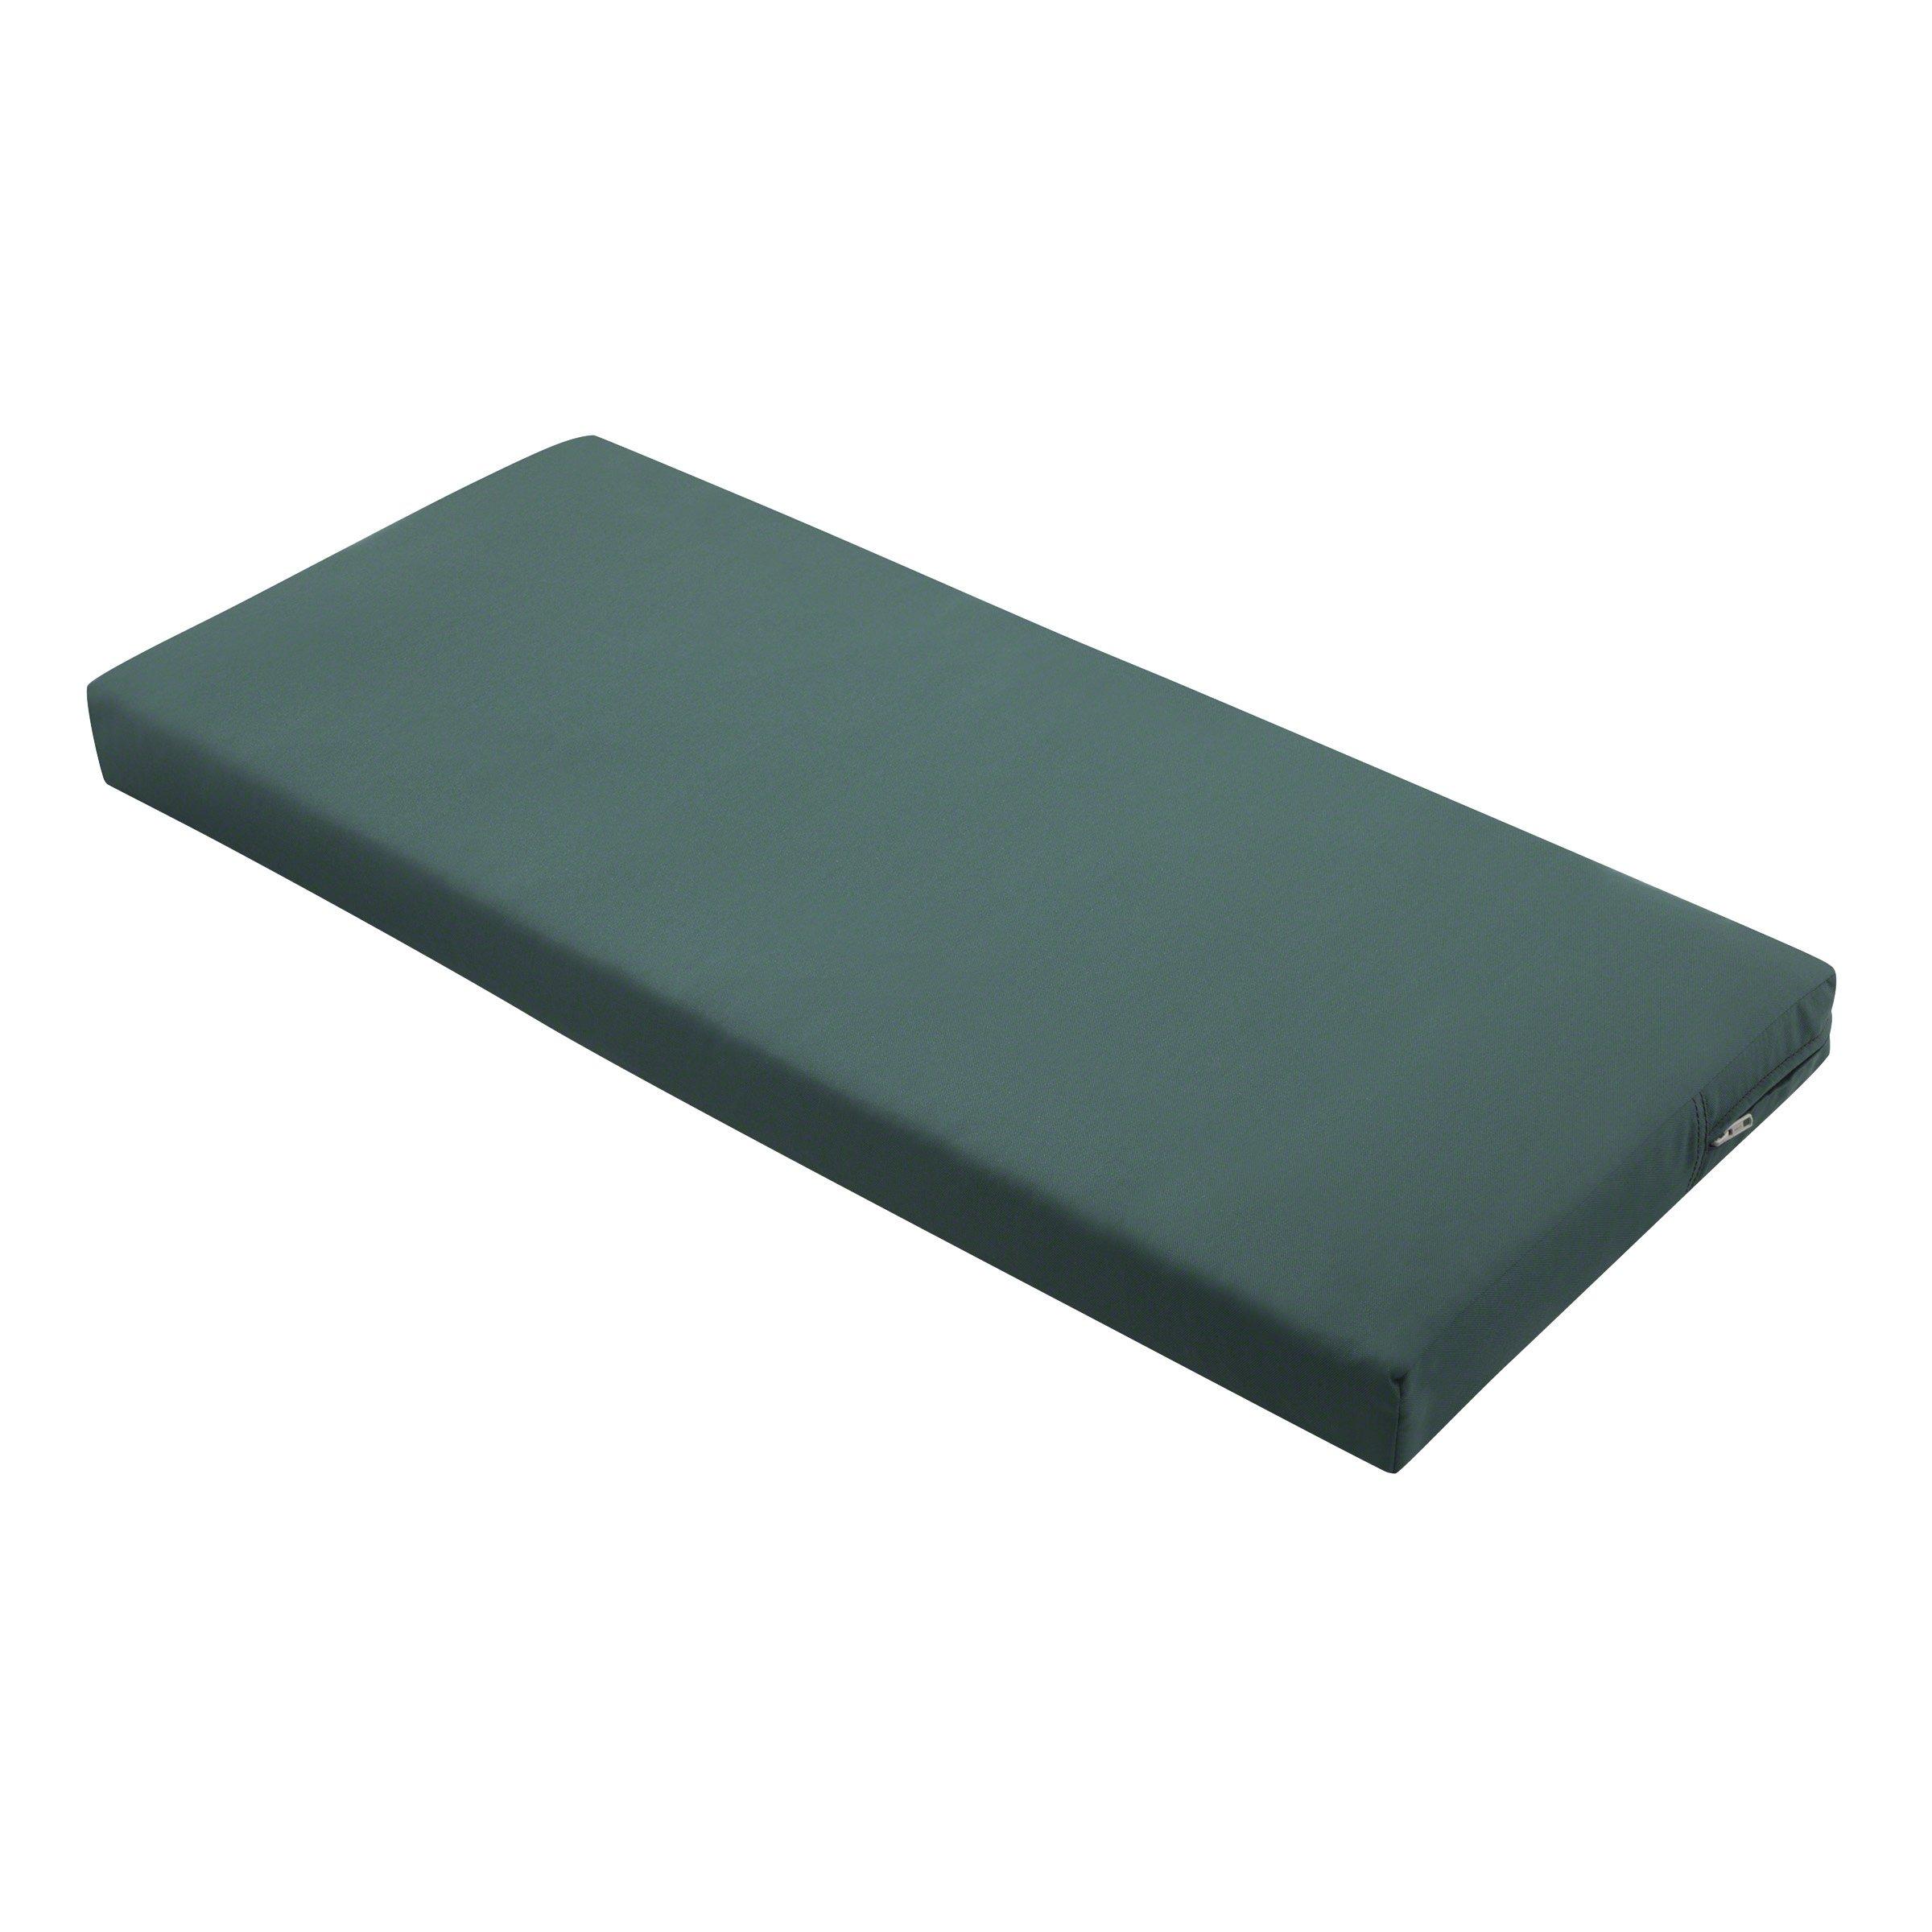 Classic Accessories Ravenna Outdoor Patio Bench/Settee Cushion, Mallard Green, 48'' W x 18'' D x 3'' T